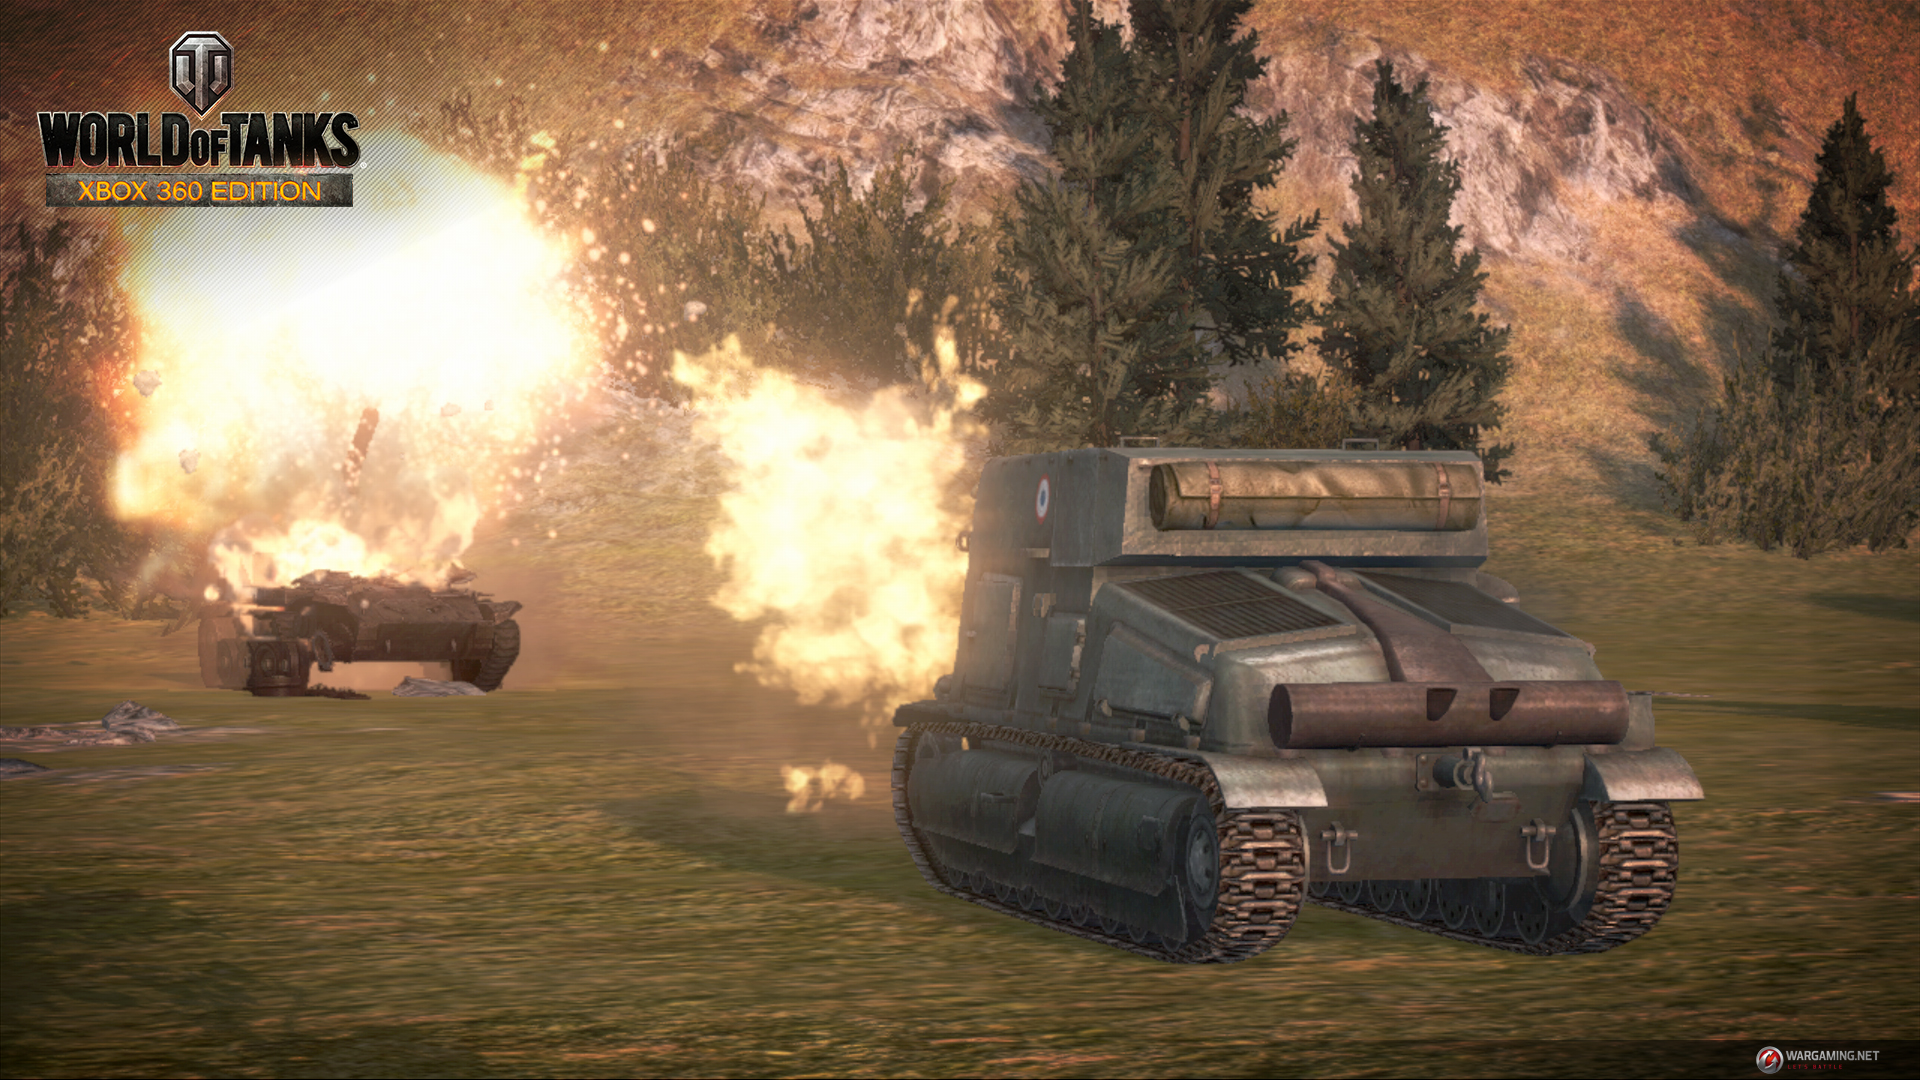 WoT_Xbox_360_Edition_Screens_Vive_la_France_Update_Image_03